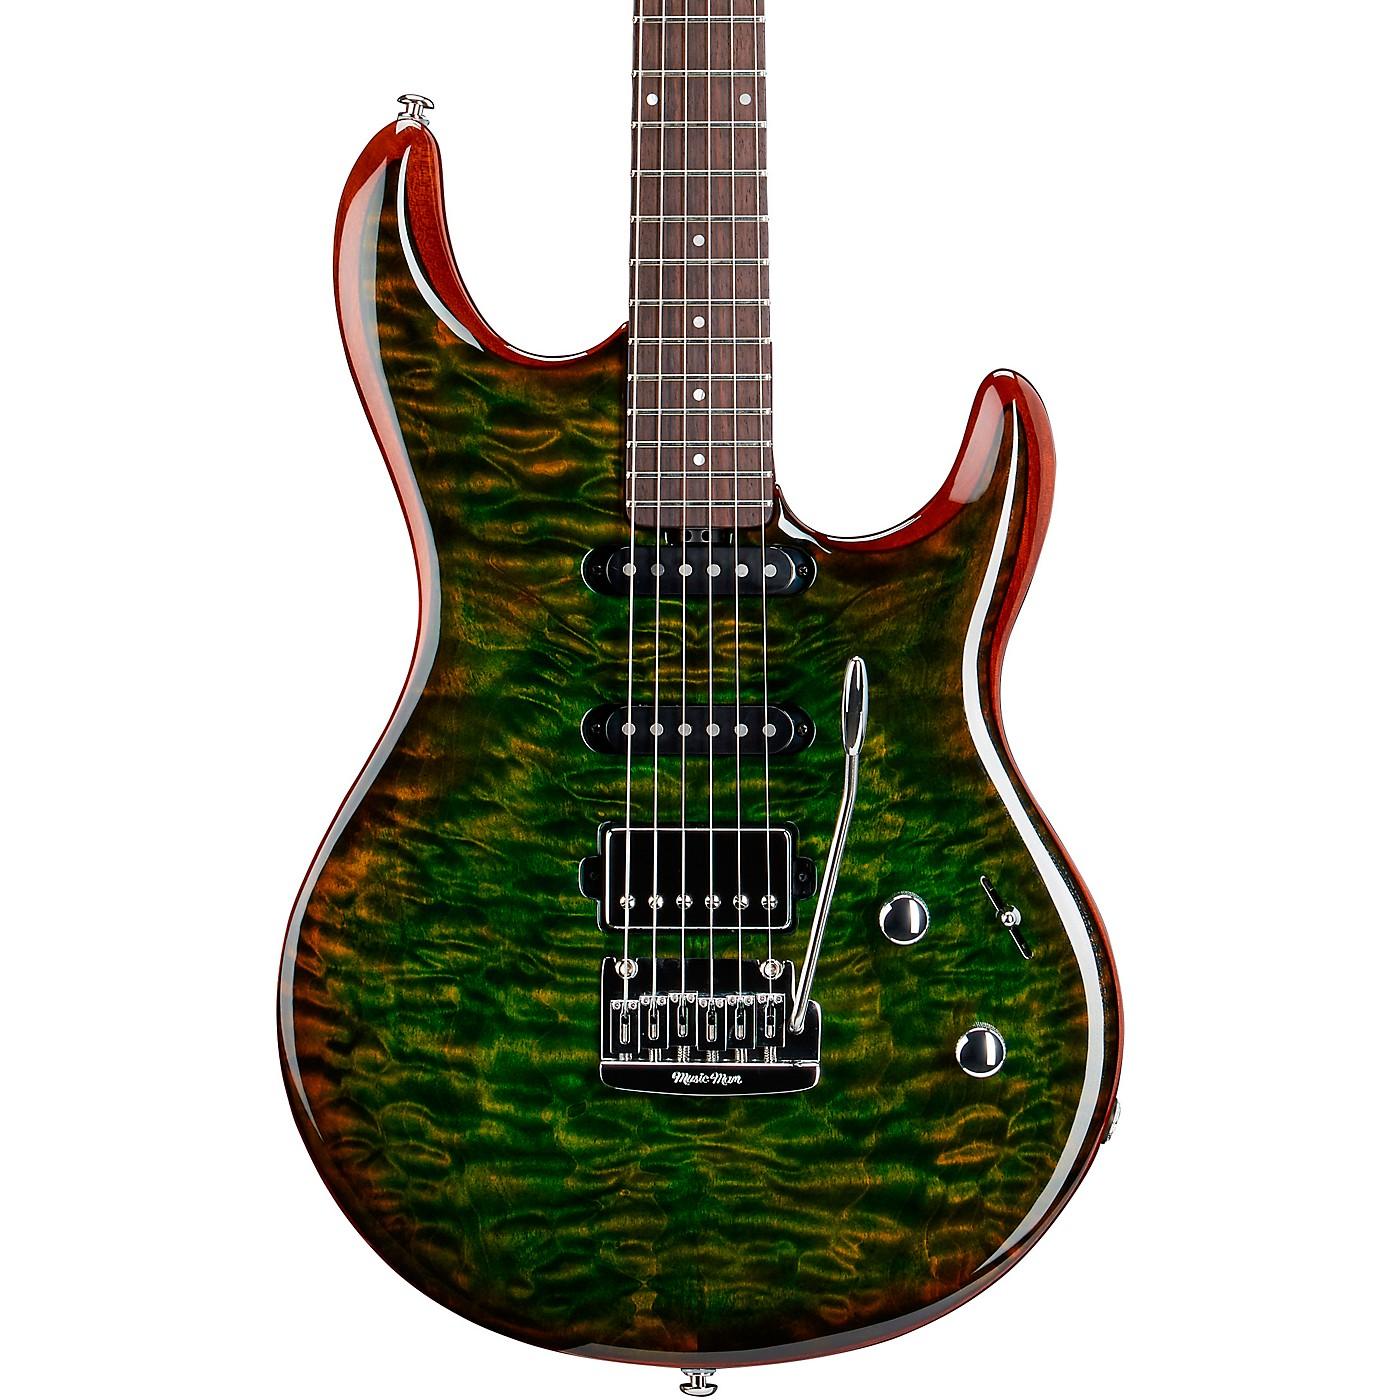 Ernie Ball Music Man Luke 3 HSS Quilt Maple Top Rosewood Fingerboard Electric Guitar thumbnail